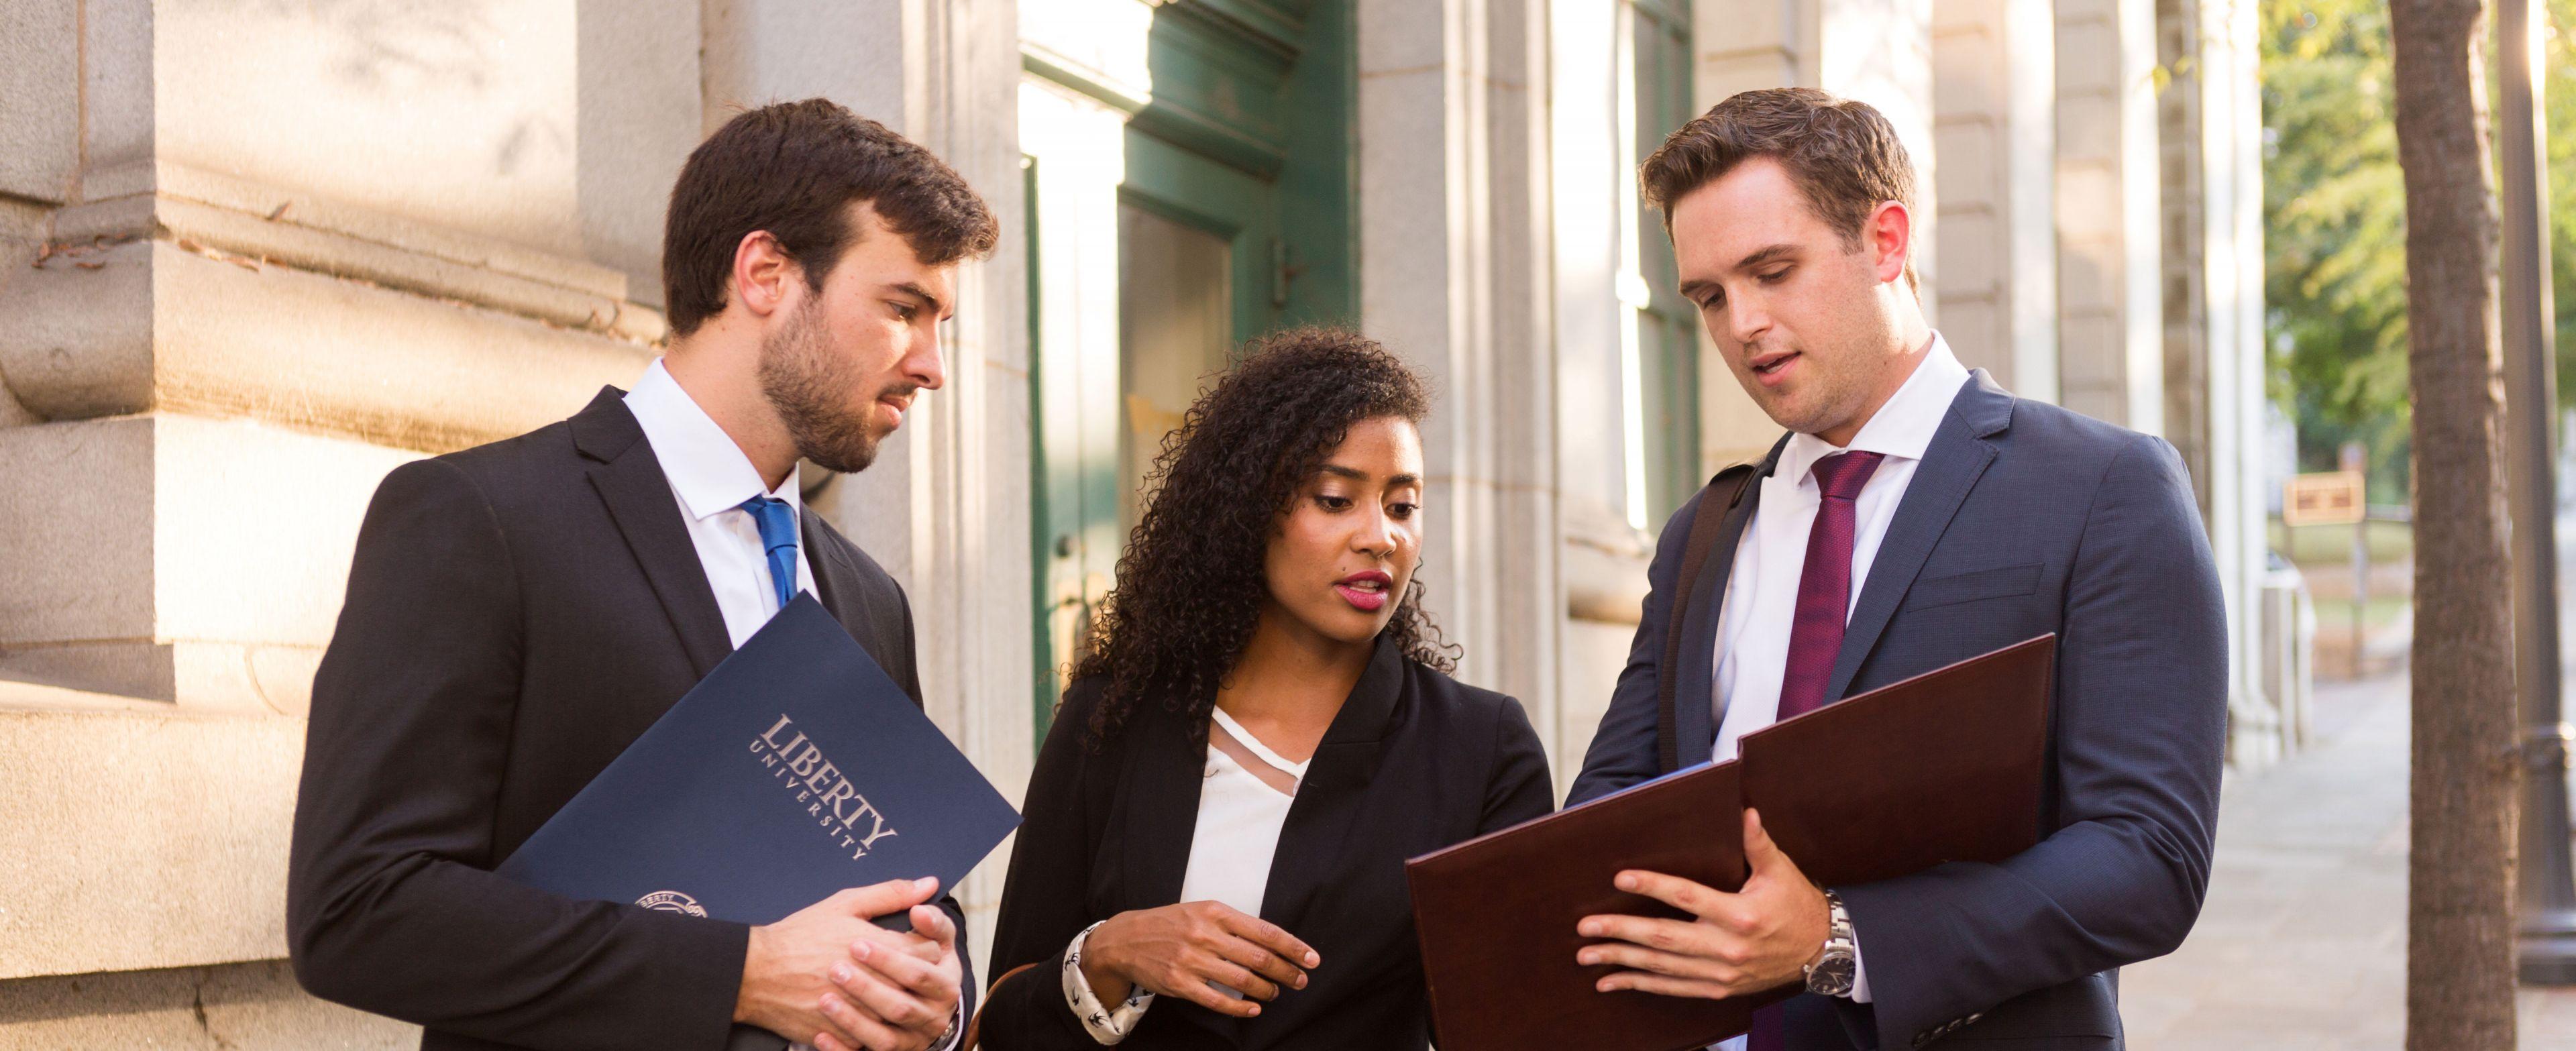 School of Business - Doctoral Programs - Liberty University